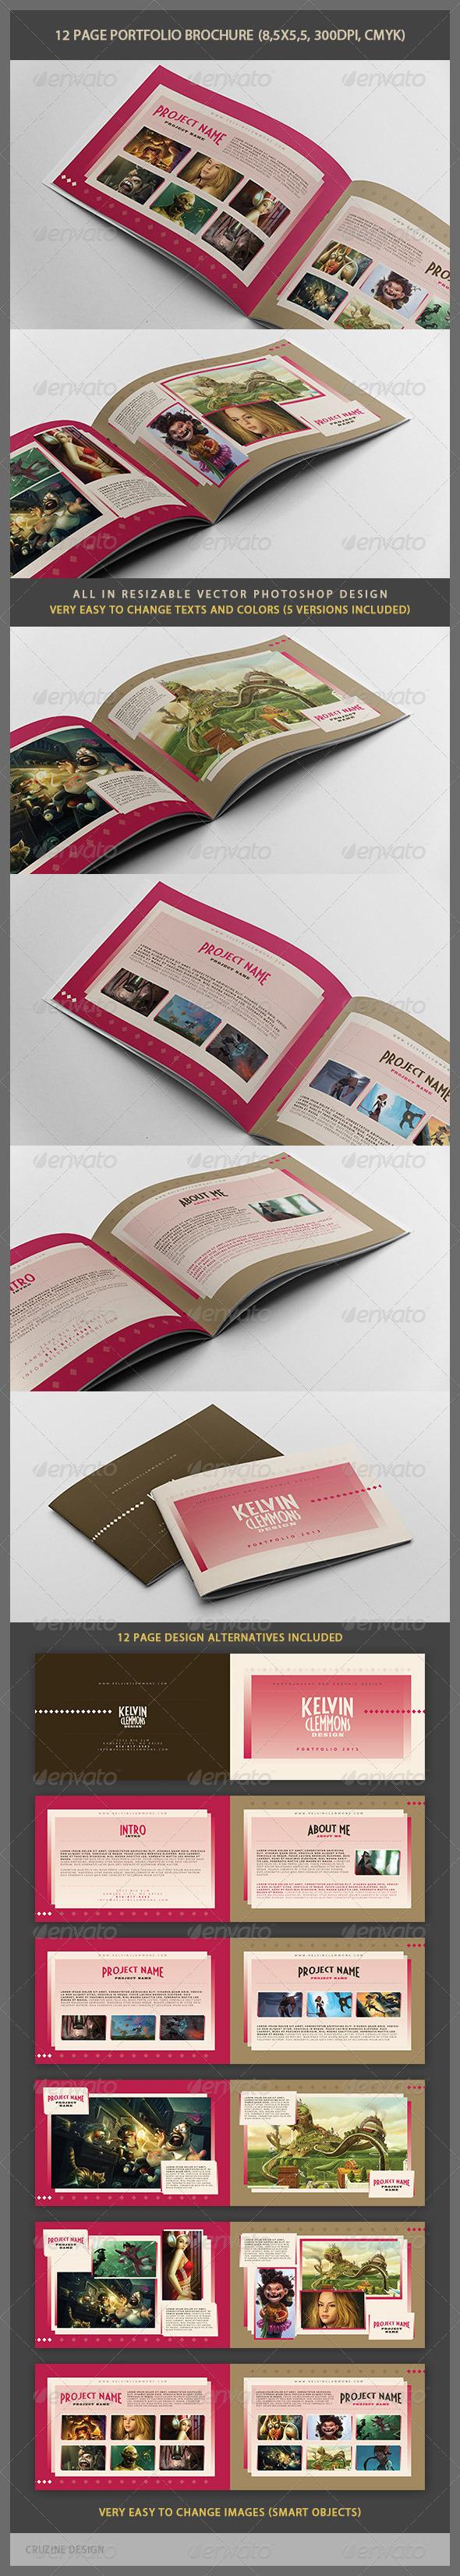 12 Page Portfolio Brochure - Portfolio Brochures